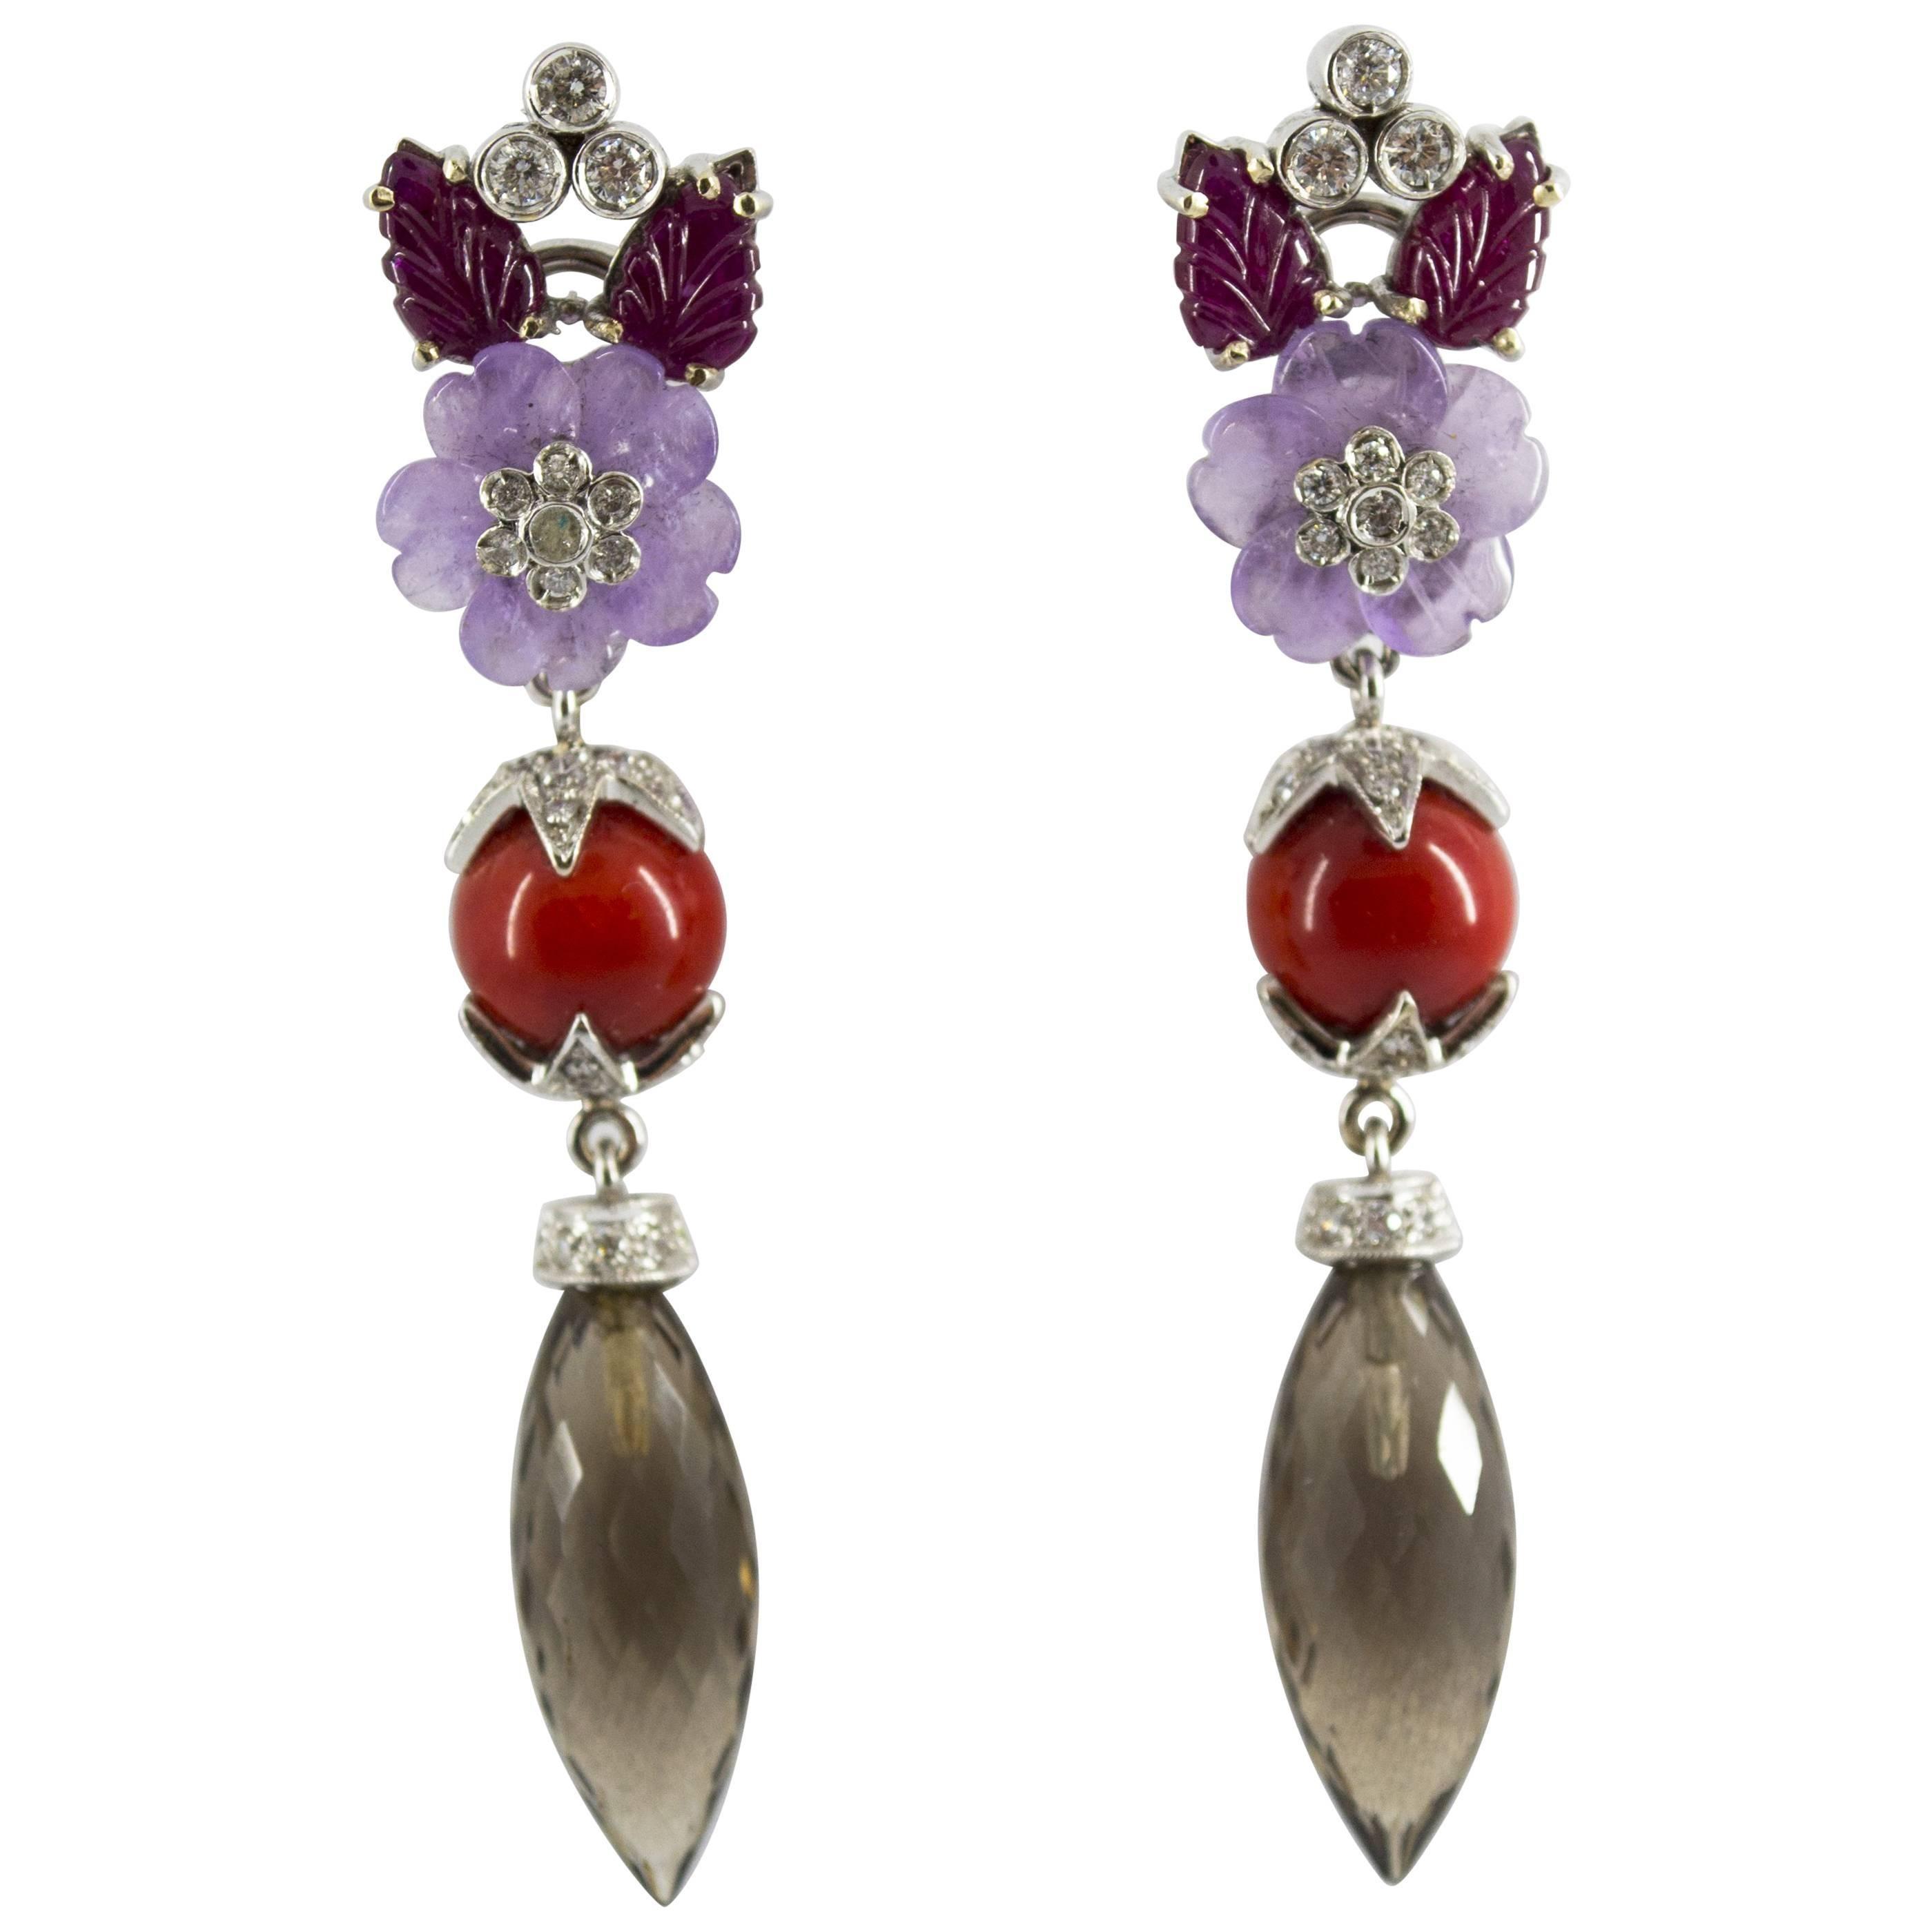 4.30 Carat Ruby 1.10 Carat Diamond Agate Fume Quartz White Gold Clip-On Earrings